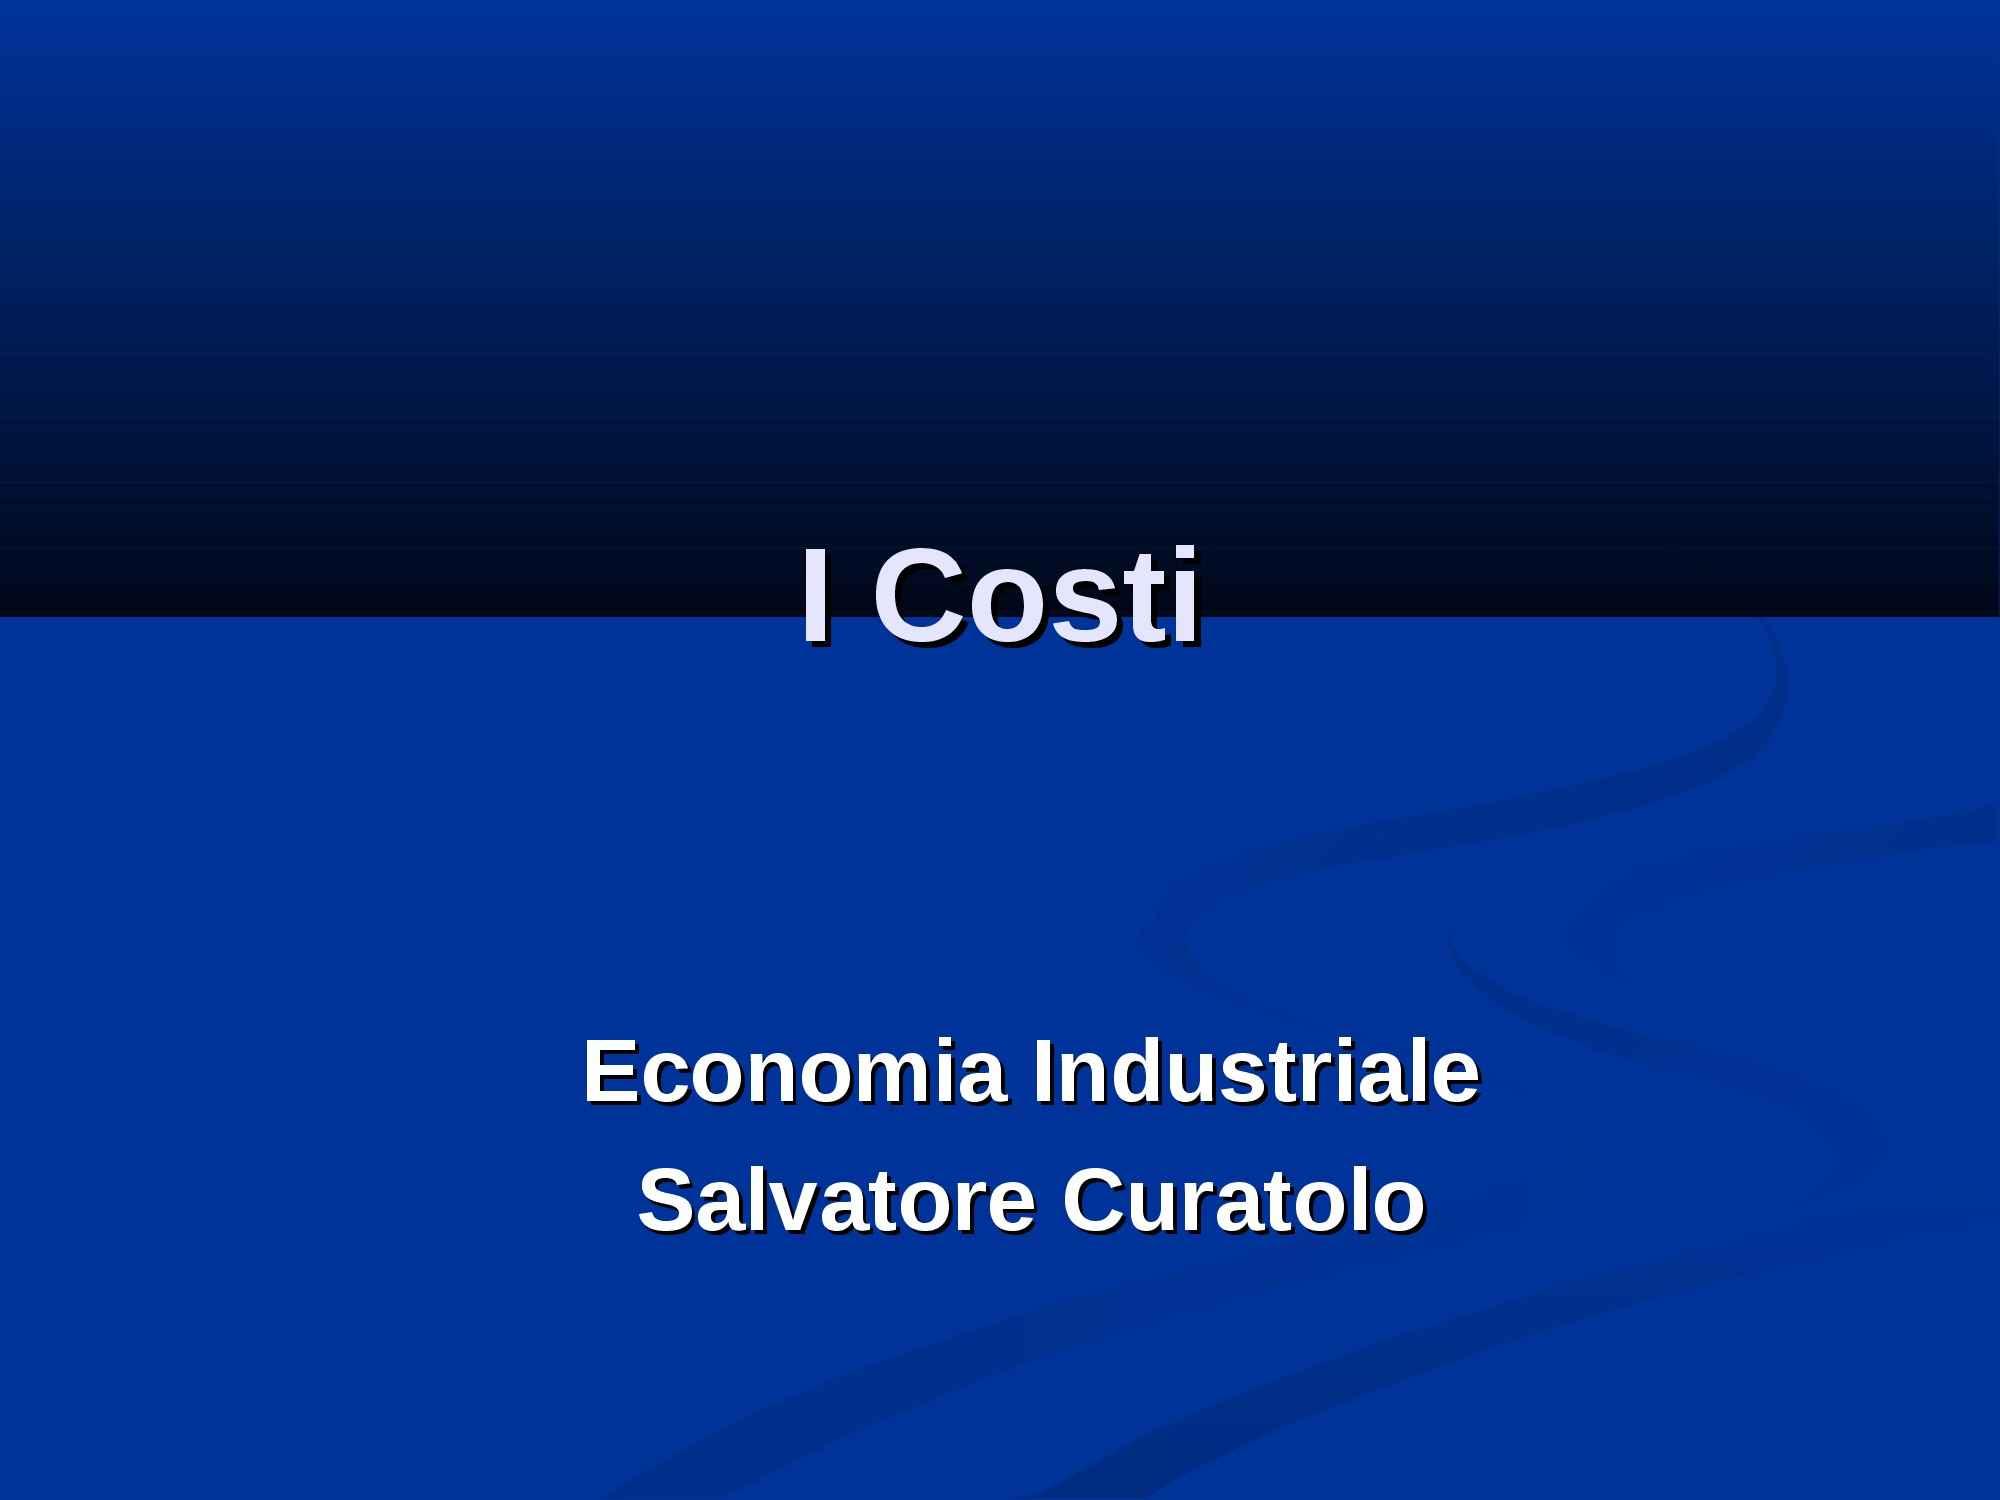 Costi - I parte